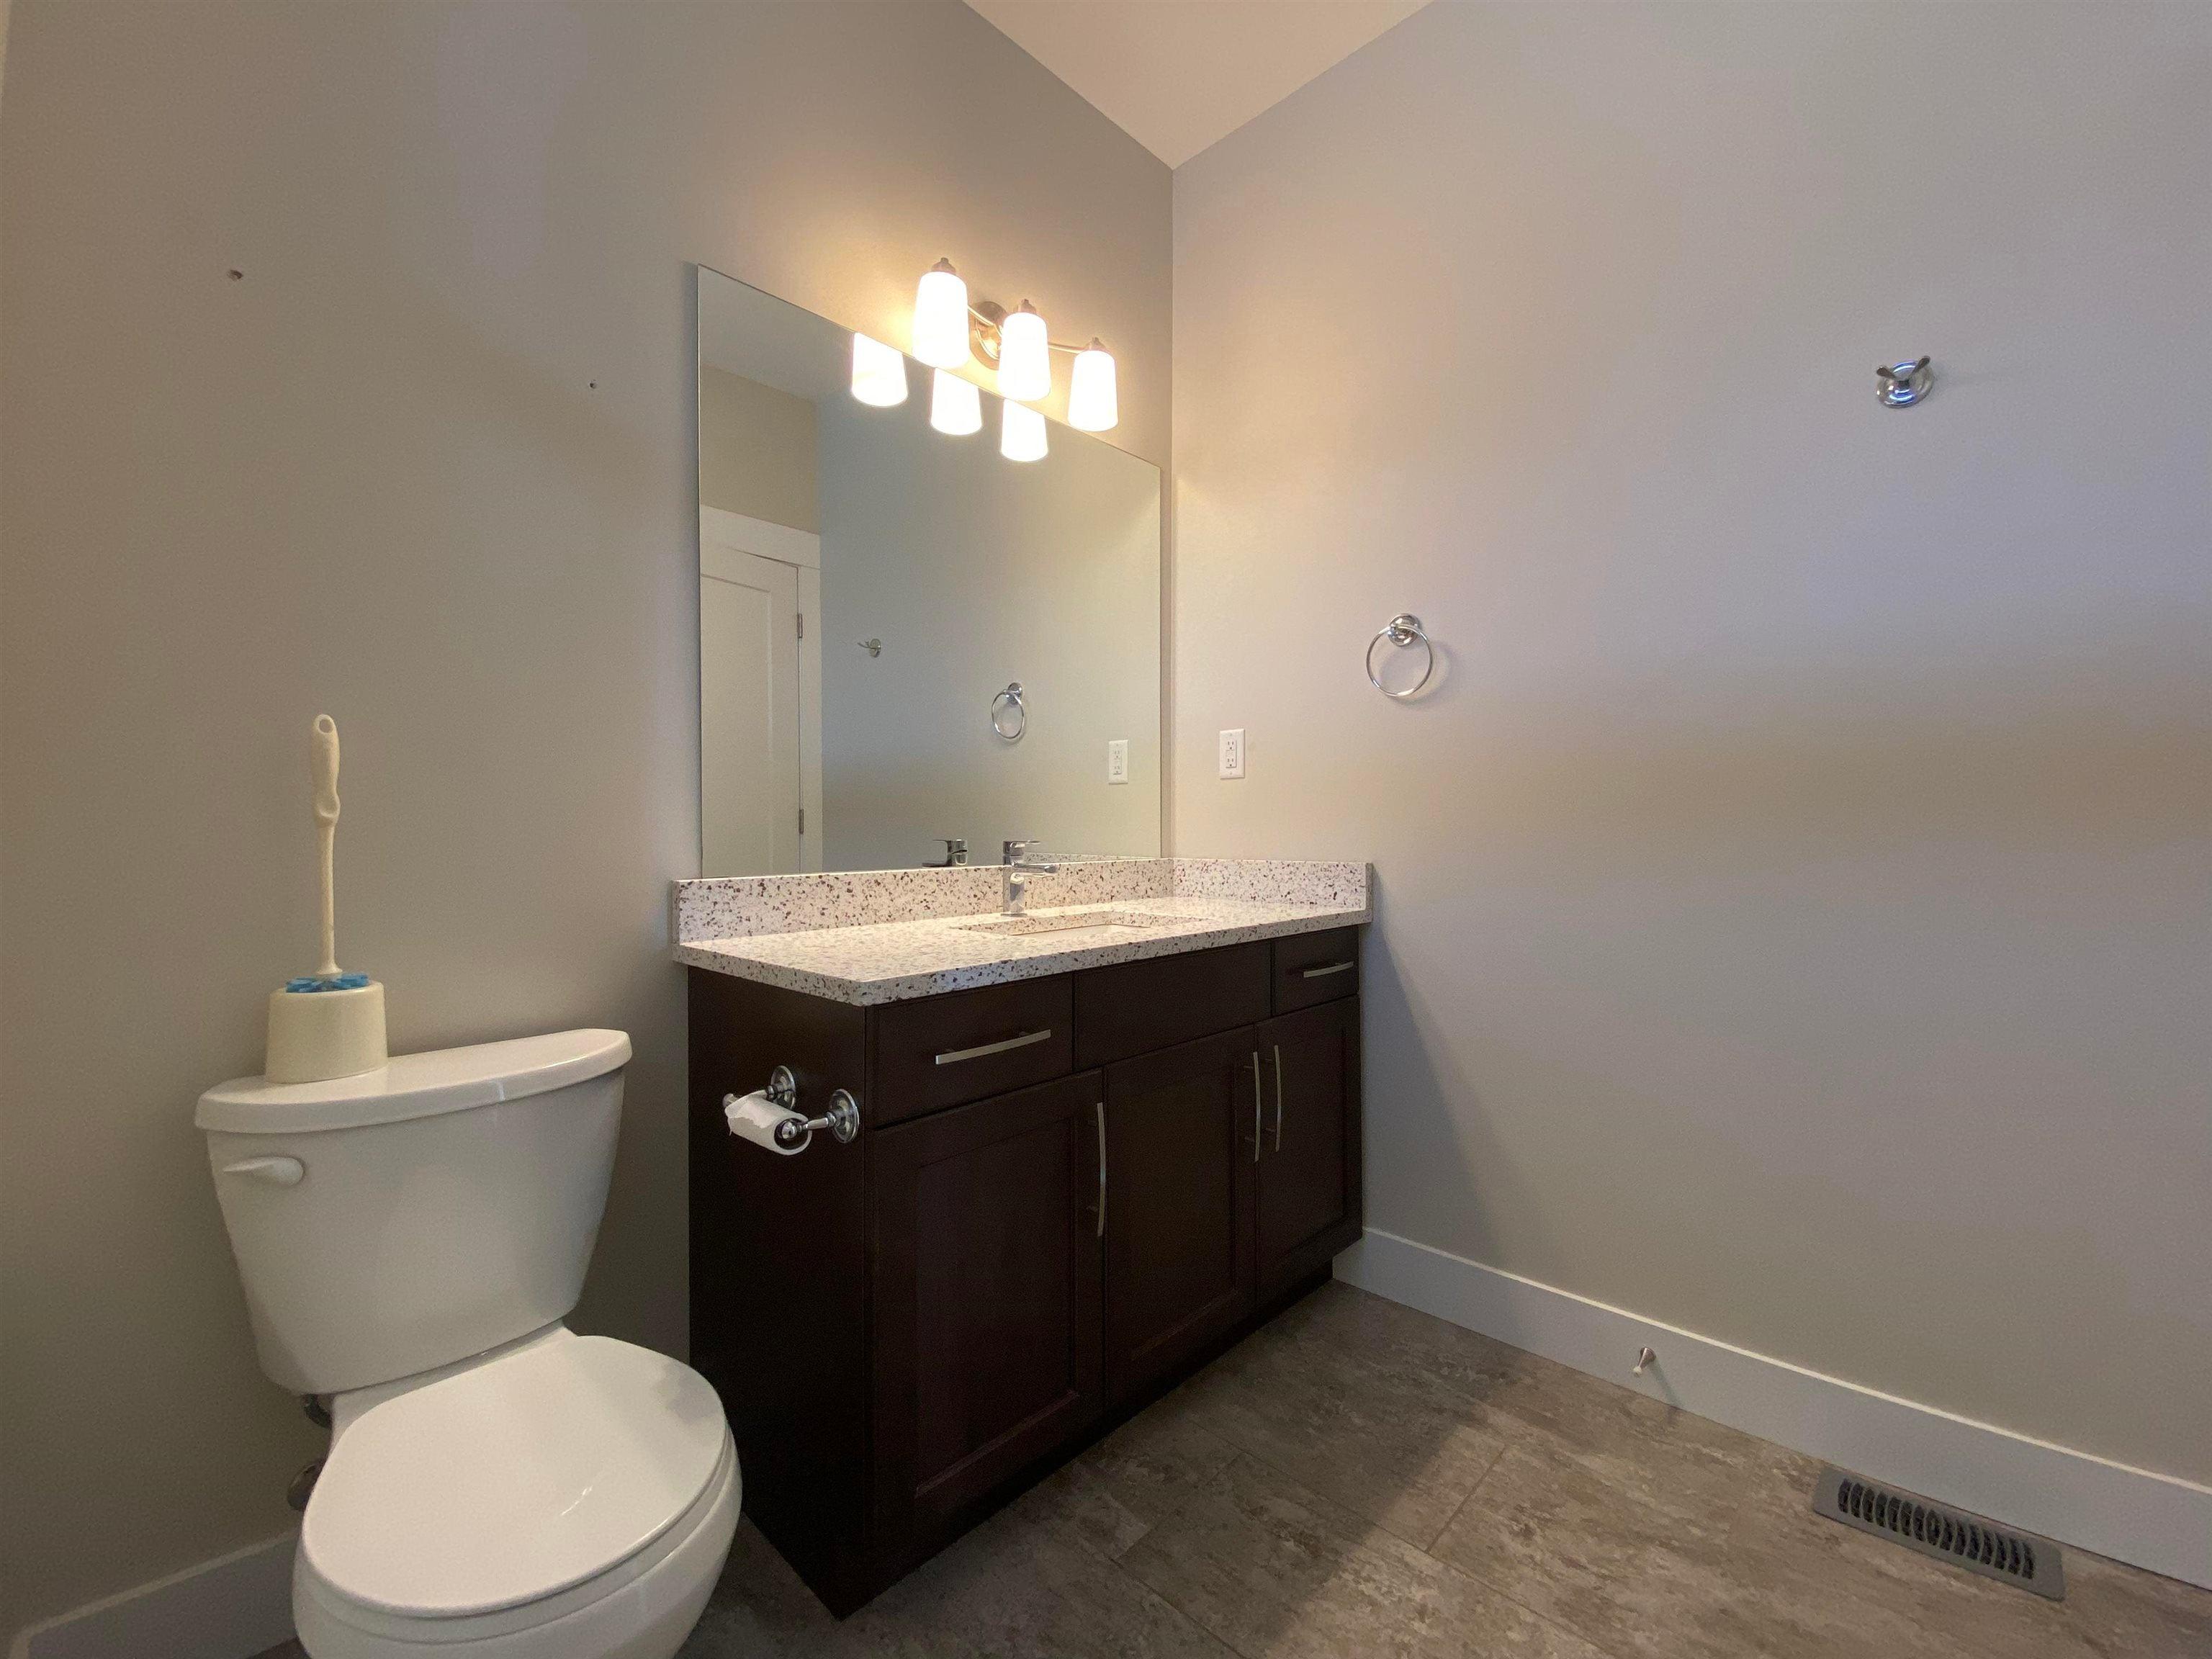 10144 KILLARNEY DRIVE - Fairfield Island House/Single Family for sale, 5 Bedrooms (R2625716) - #26